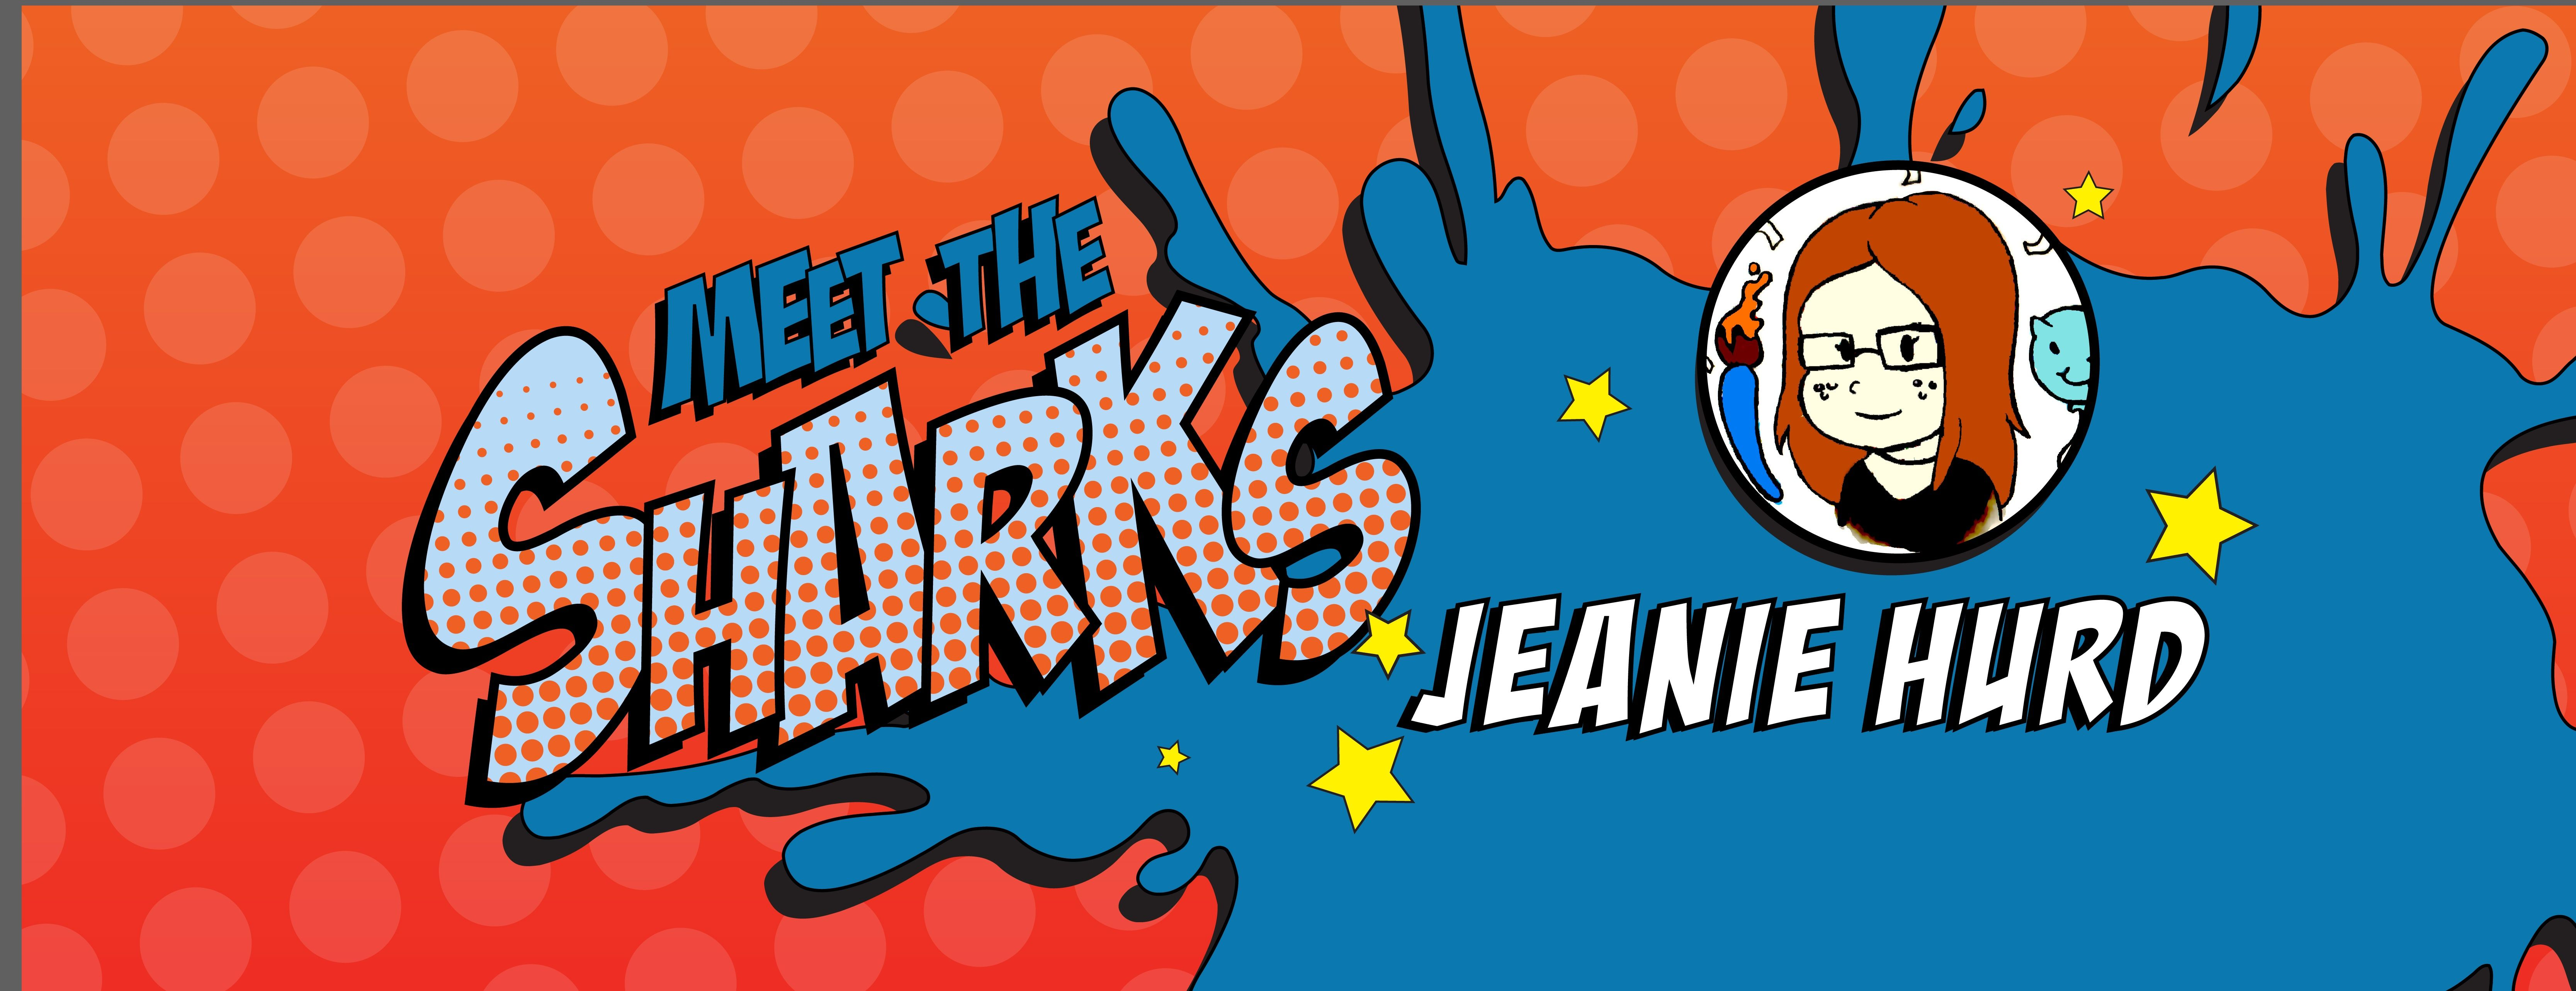 201803-ManoByte-Meet_The_Sharks_Jeanie.jpg